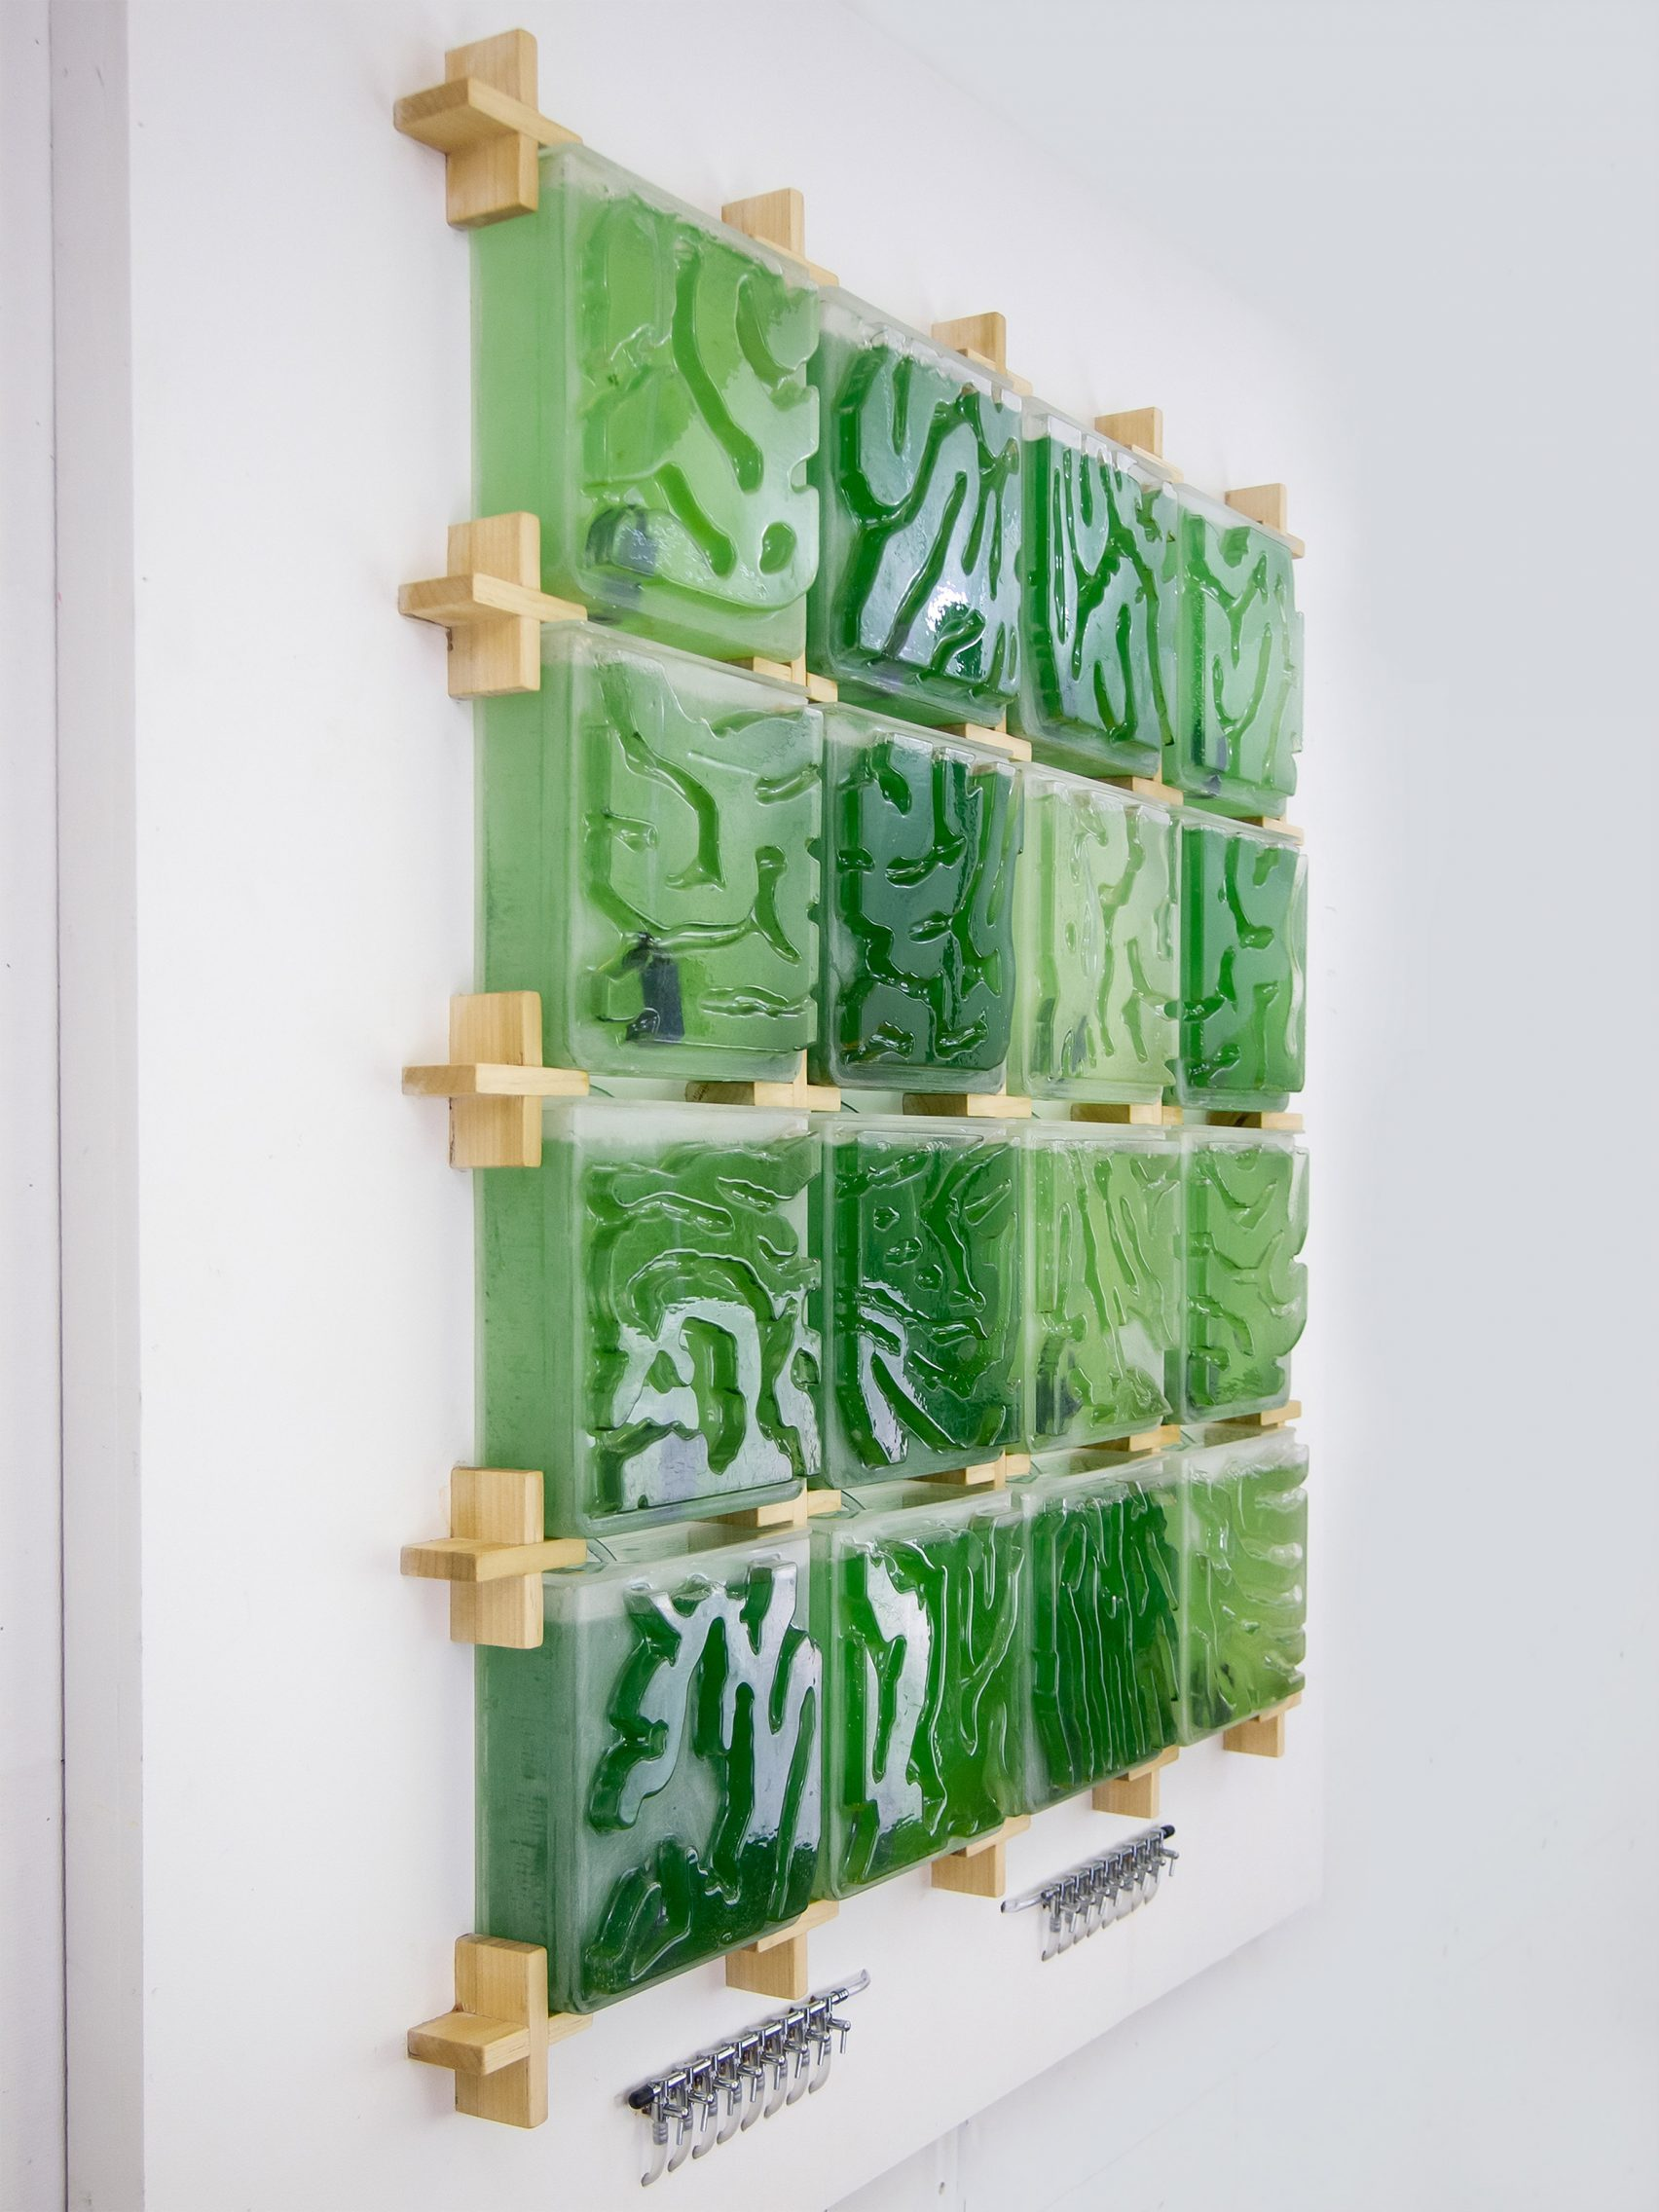 the-coral-algae-farm-design_dezeen_2364_col_12-1704x2272.jpg